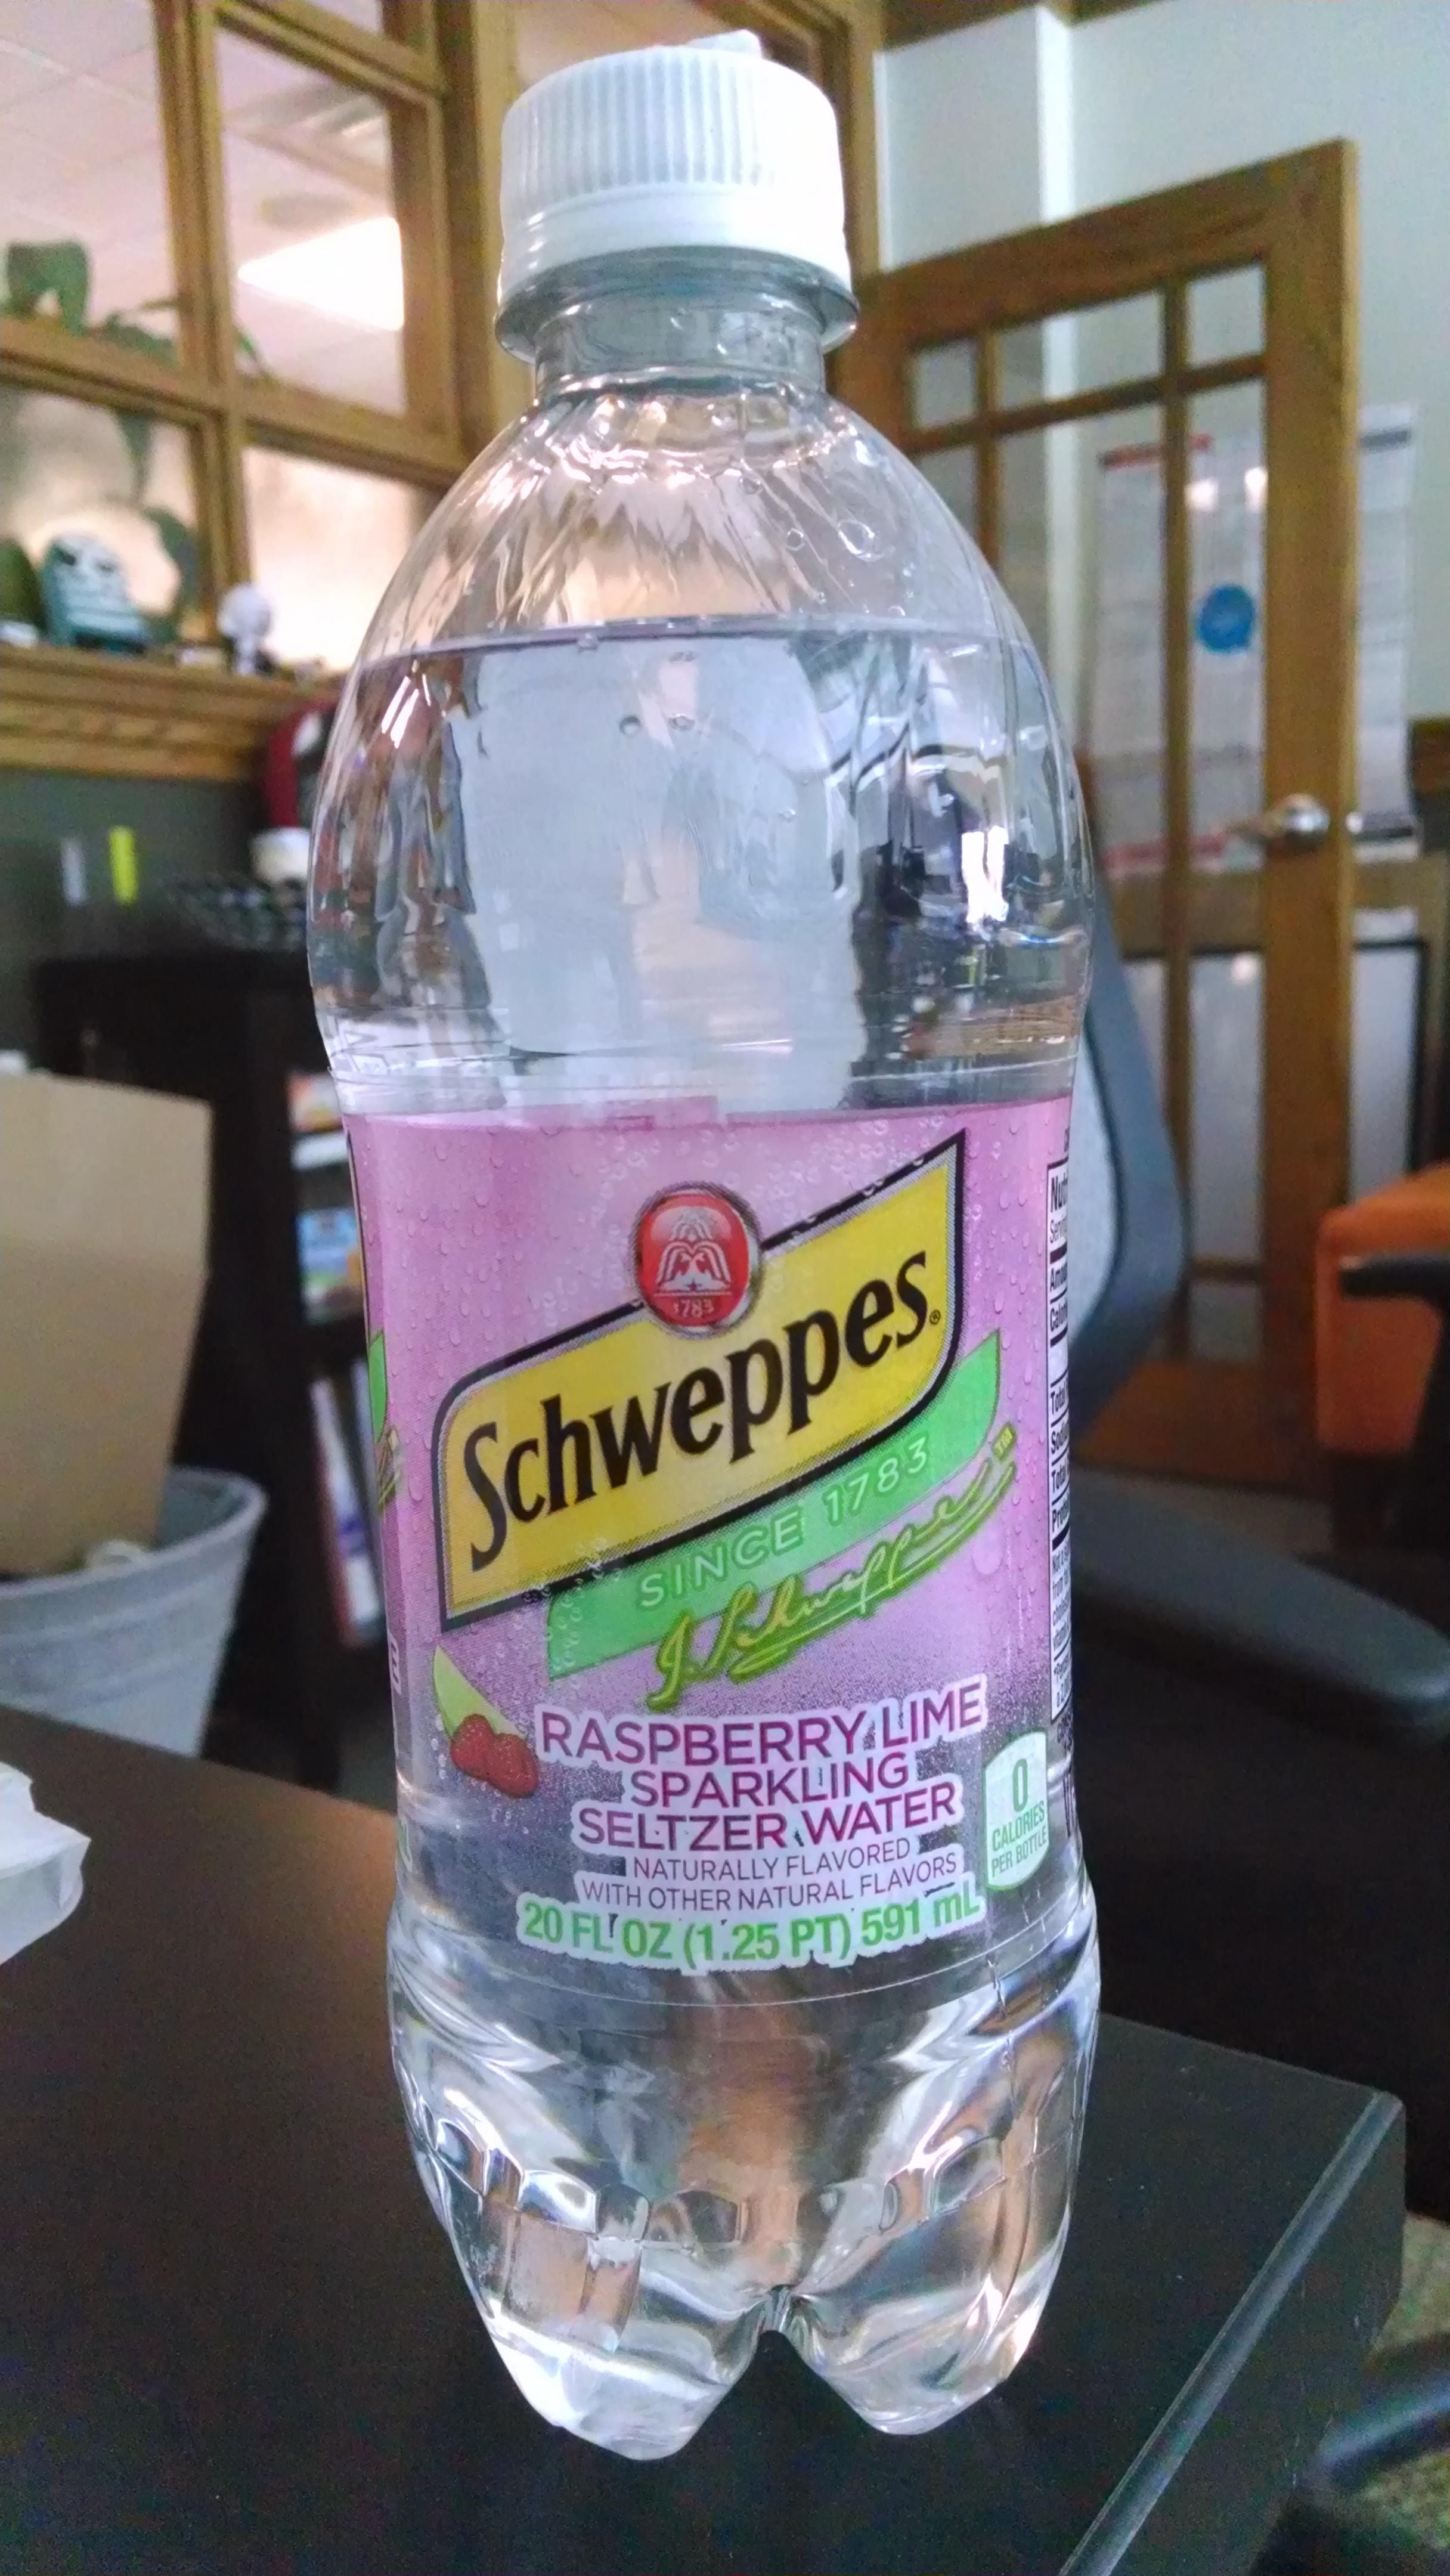 Thirsty Dudes Schweppes Seltzer Raspberry Lime